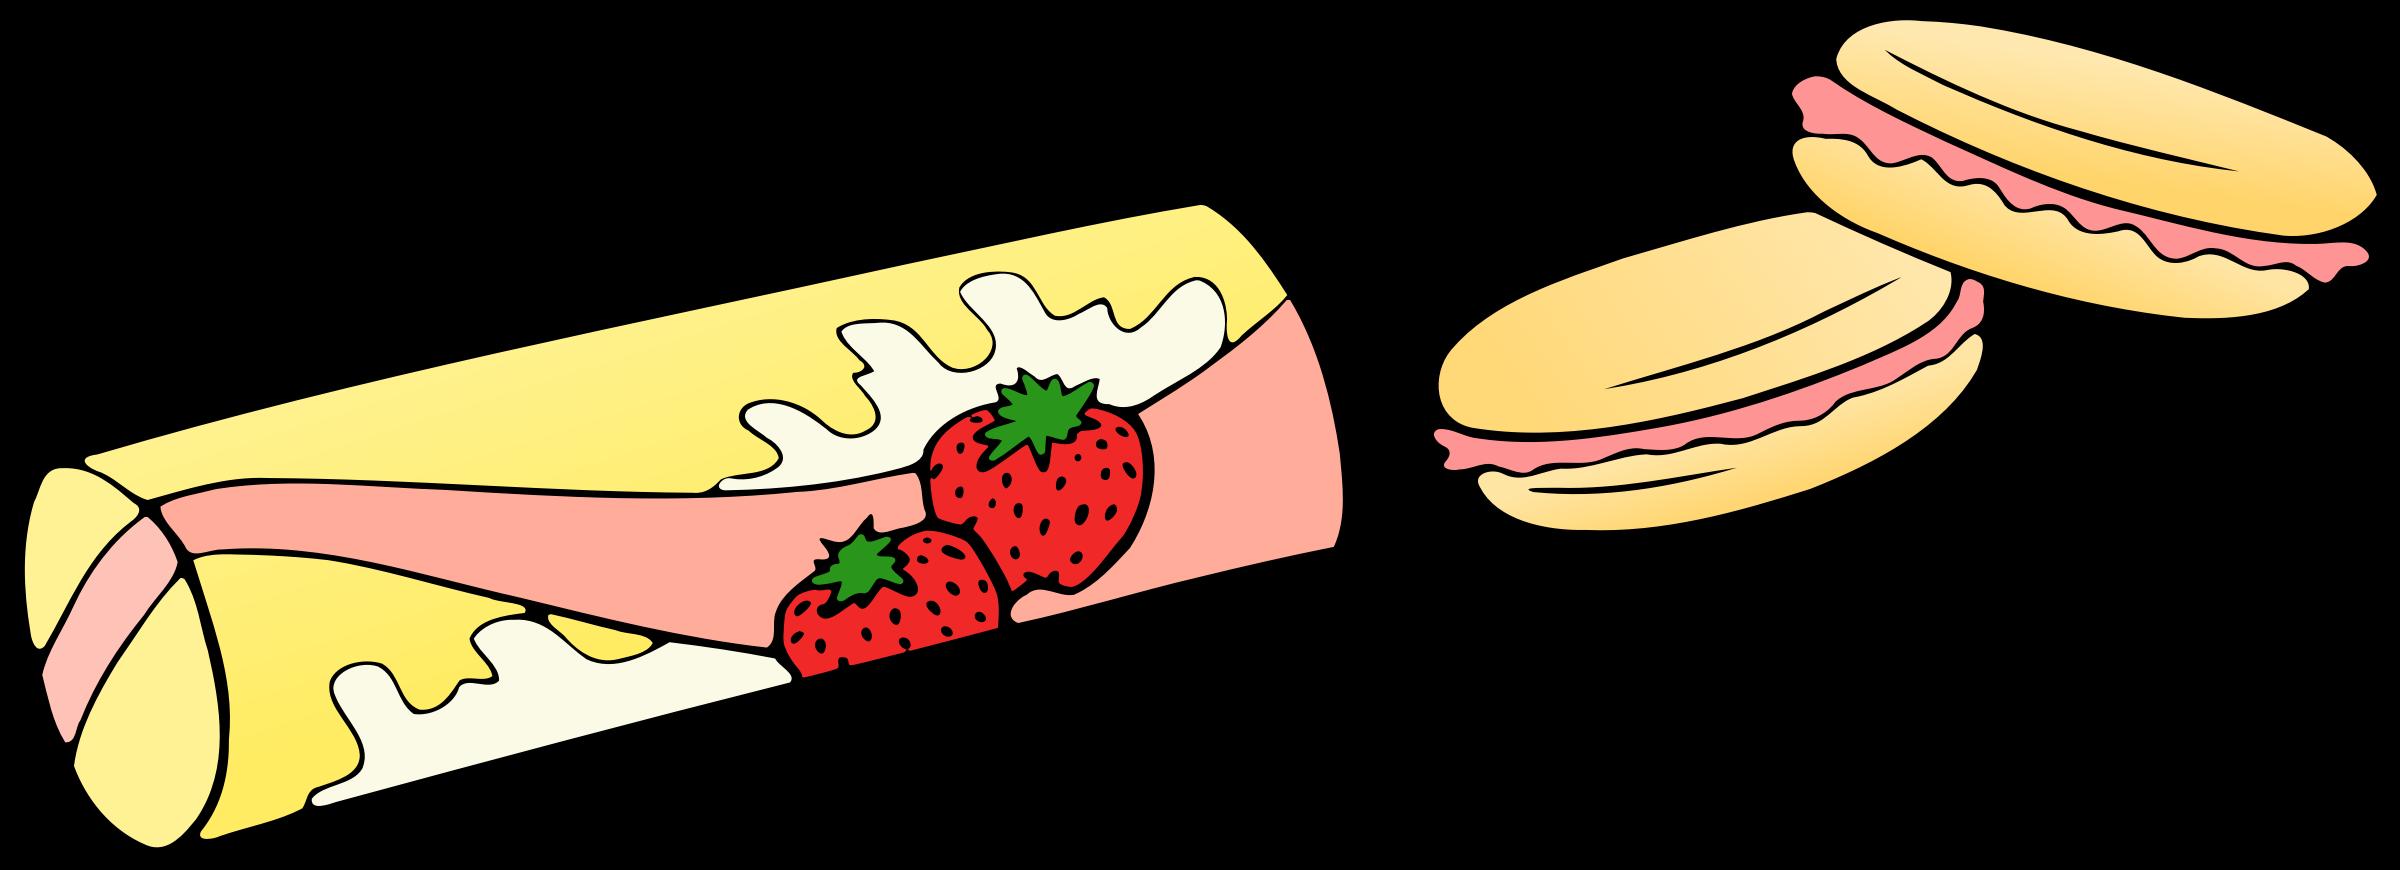 Snacks vector clipart clip art Strawberry Snacks Vector Clipart image - Free stock photo ... clip art